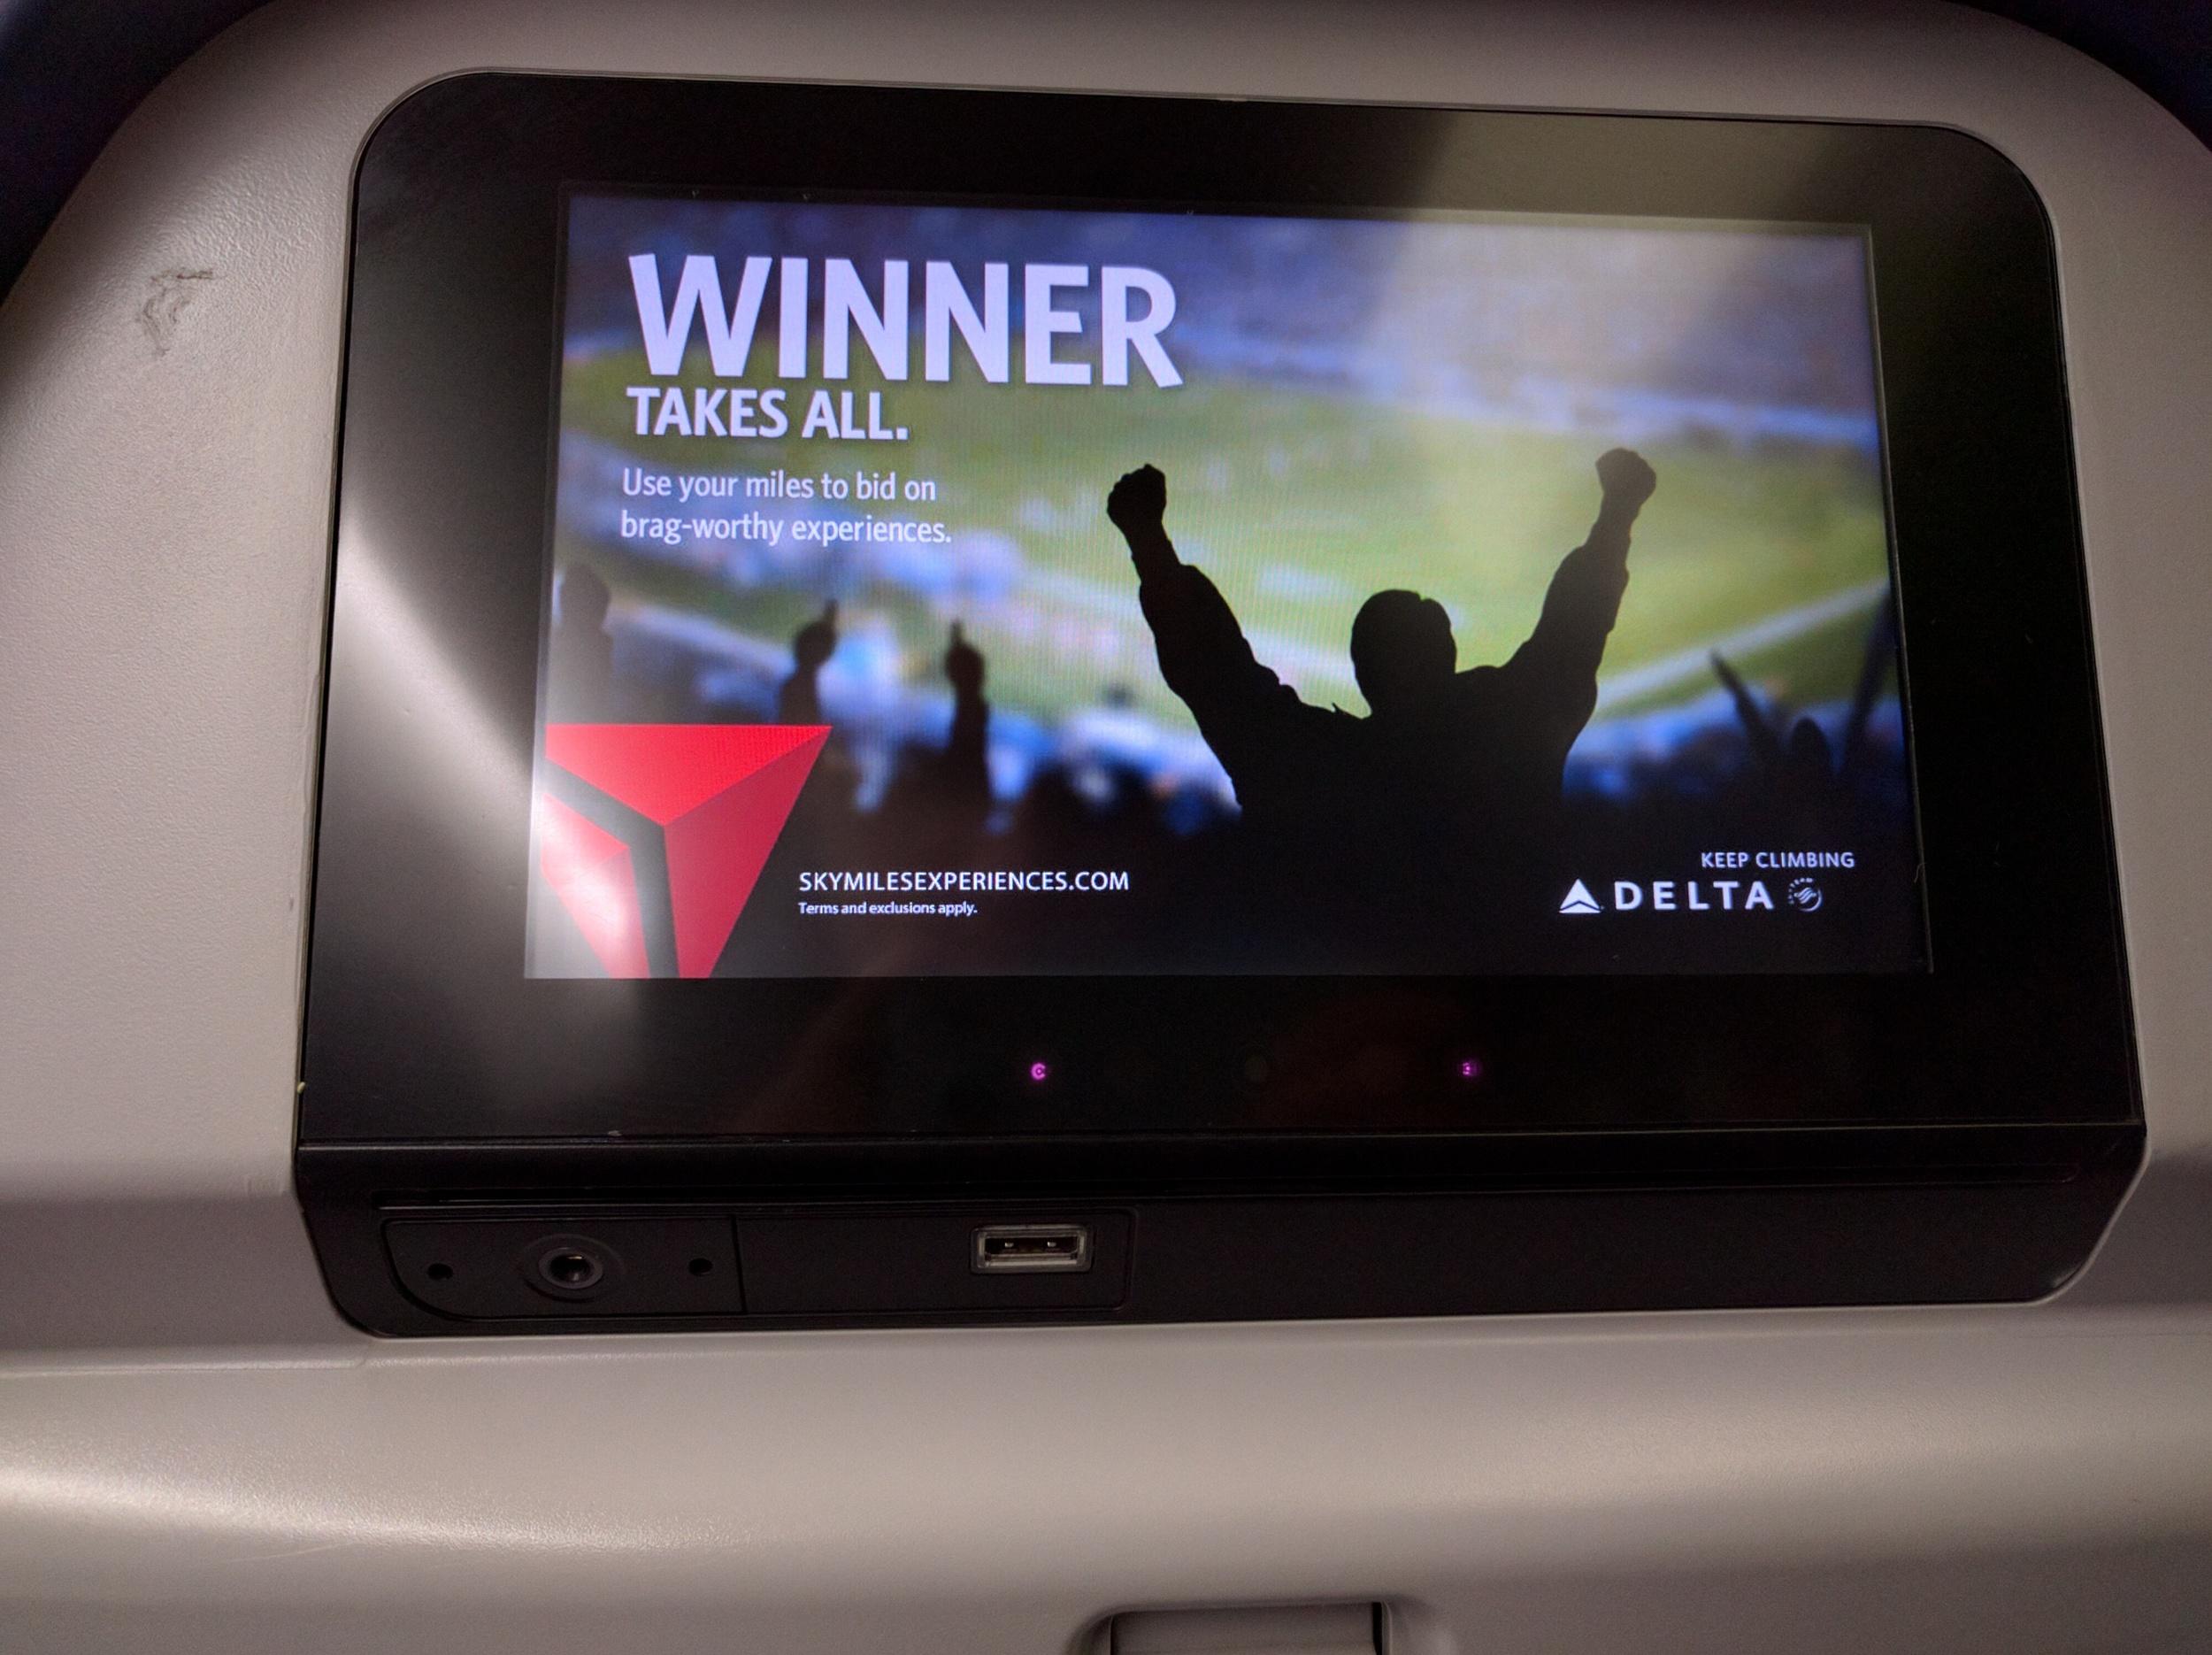 Delta 767-300 Entertainment System - Economy